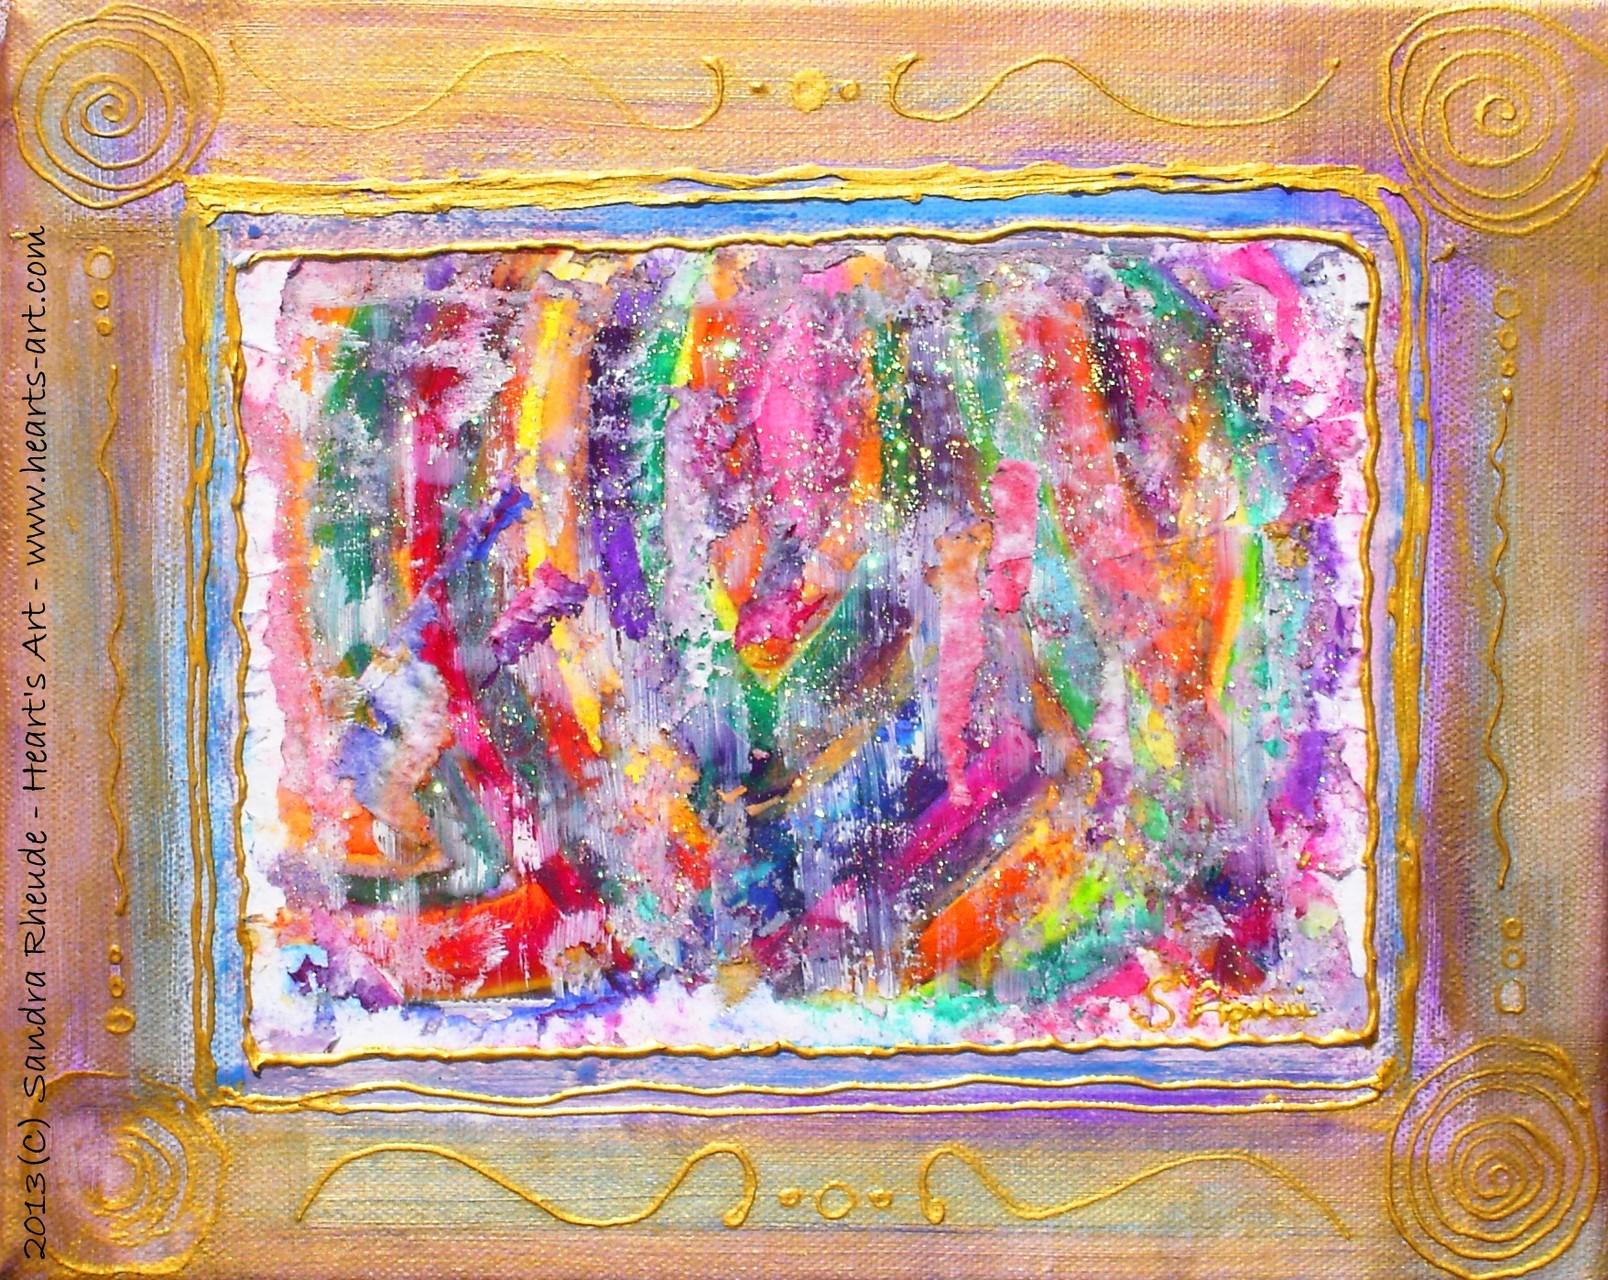 'A Look inside' - 2013/67 - Acryl/MixedMedia auf Leinwand - 30 x 24 cm - € 130